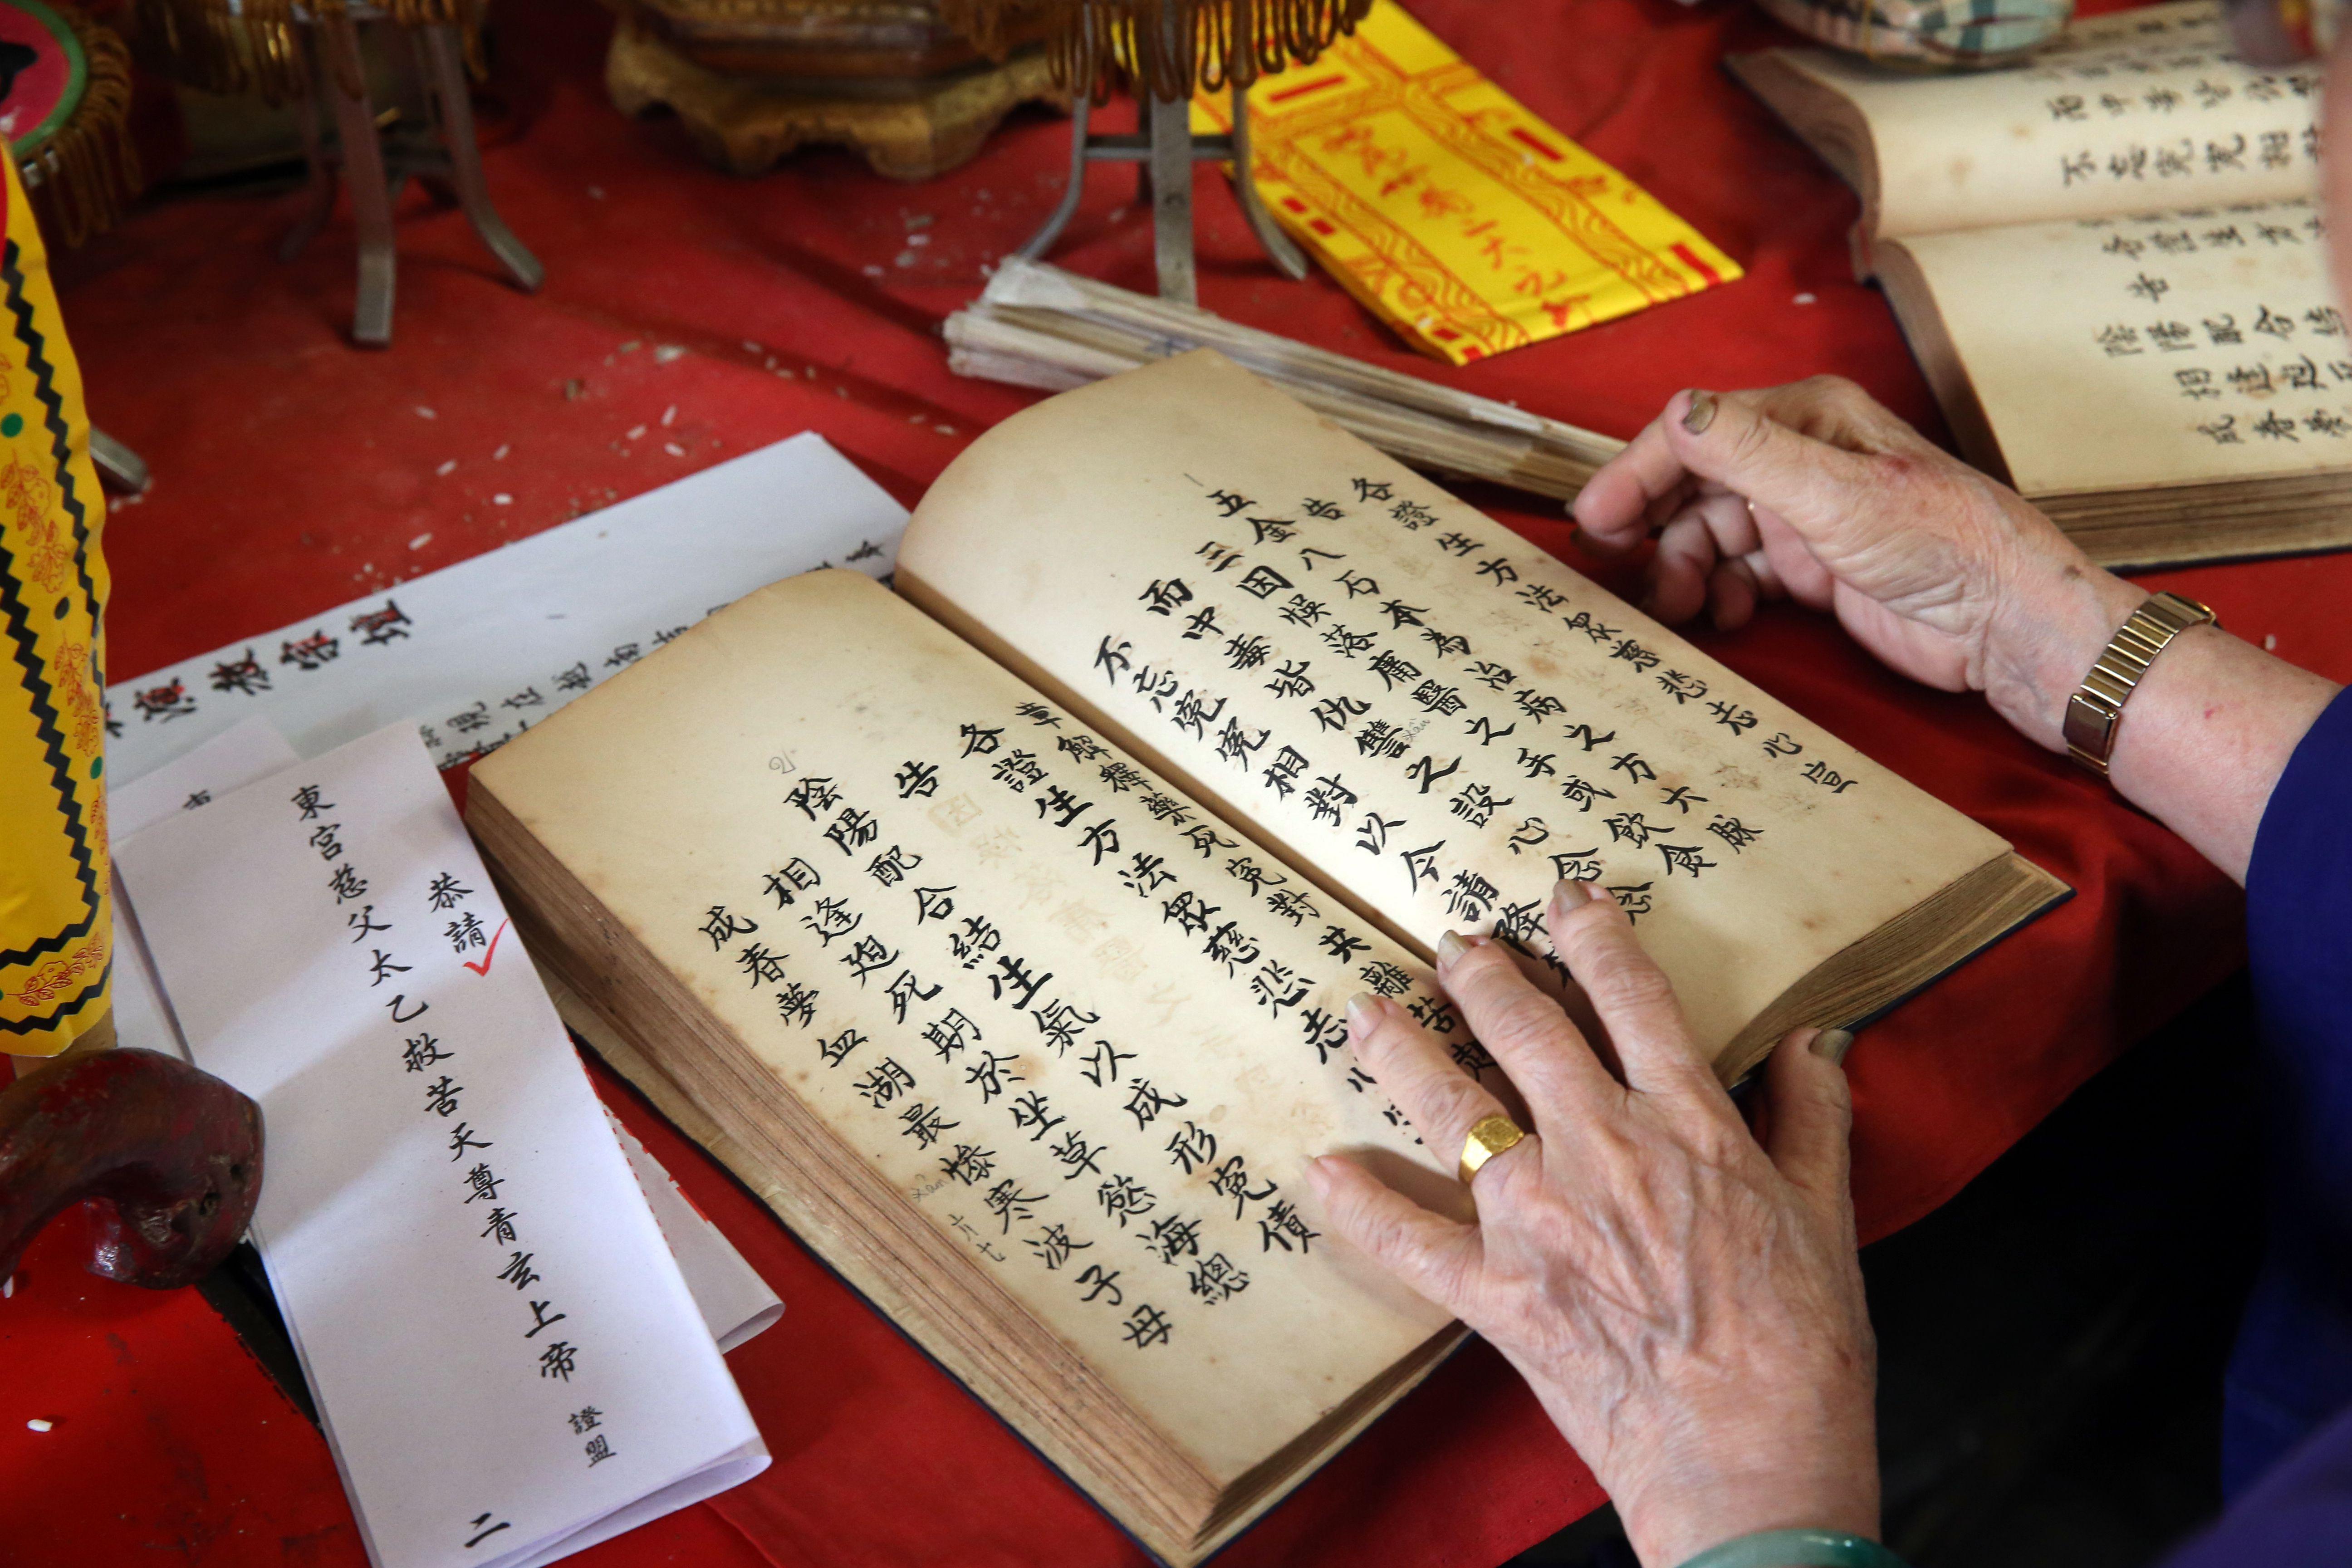 Asian taoist massage techniques - 1 2